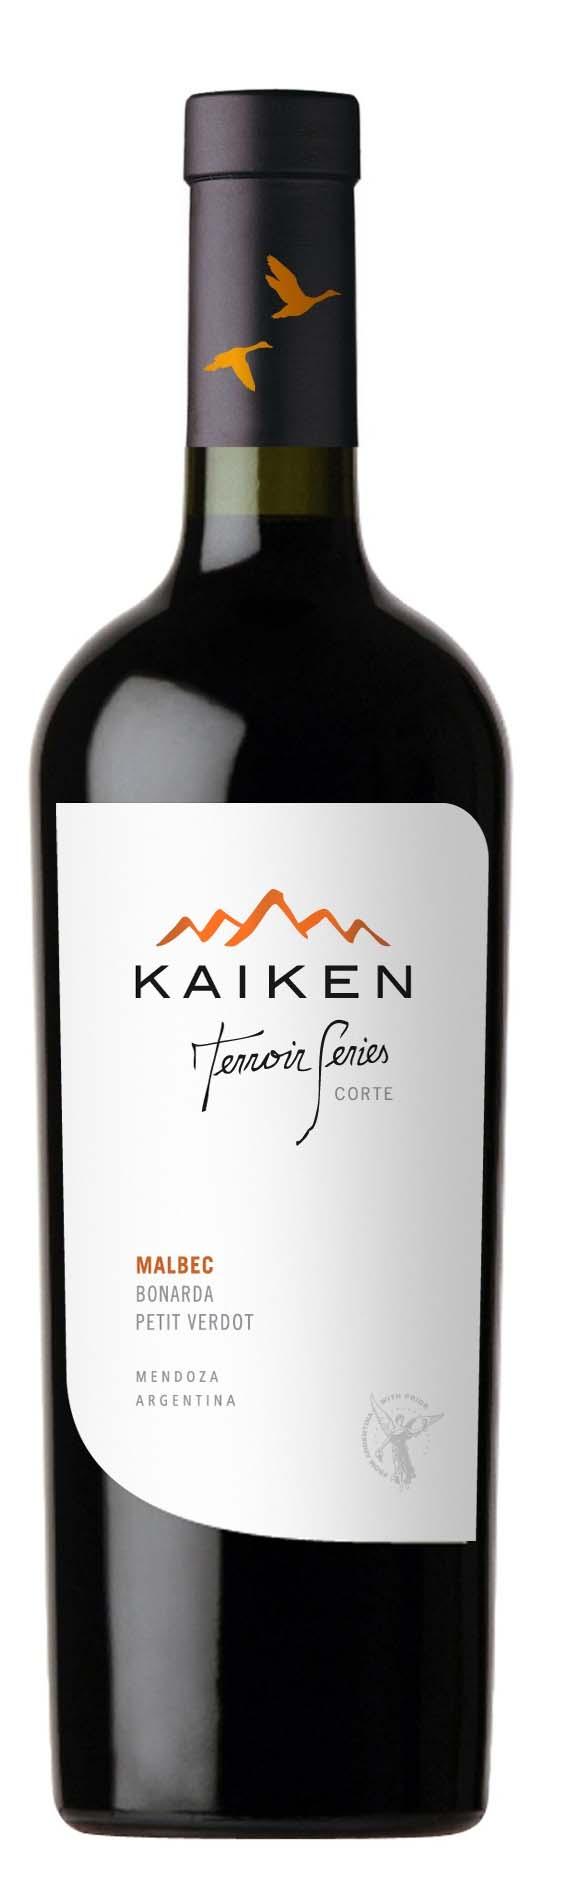 Kaiken Terroir Series Malbec Bonarda Petit Verdot IRISH WINE OF THE YEAR